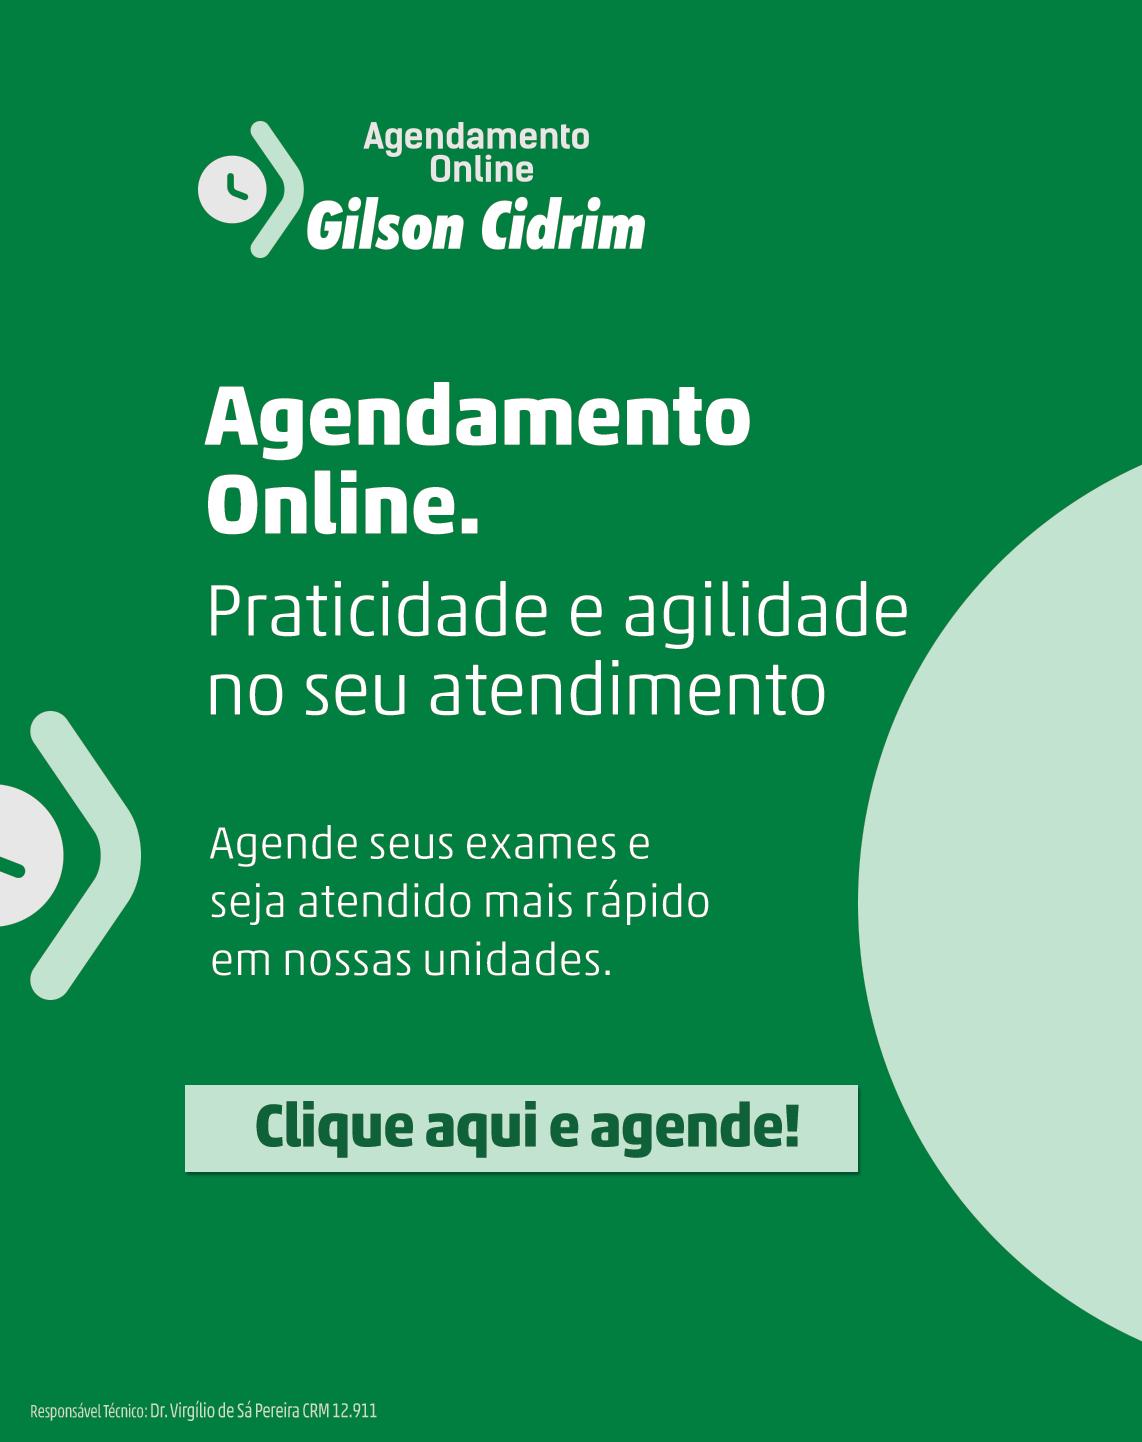 Agendamento Online Gilson Cidrim